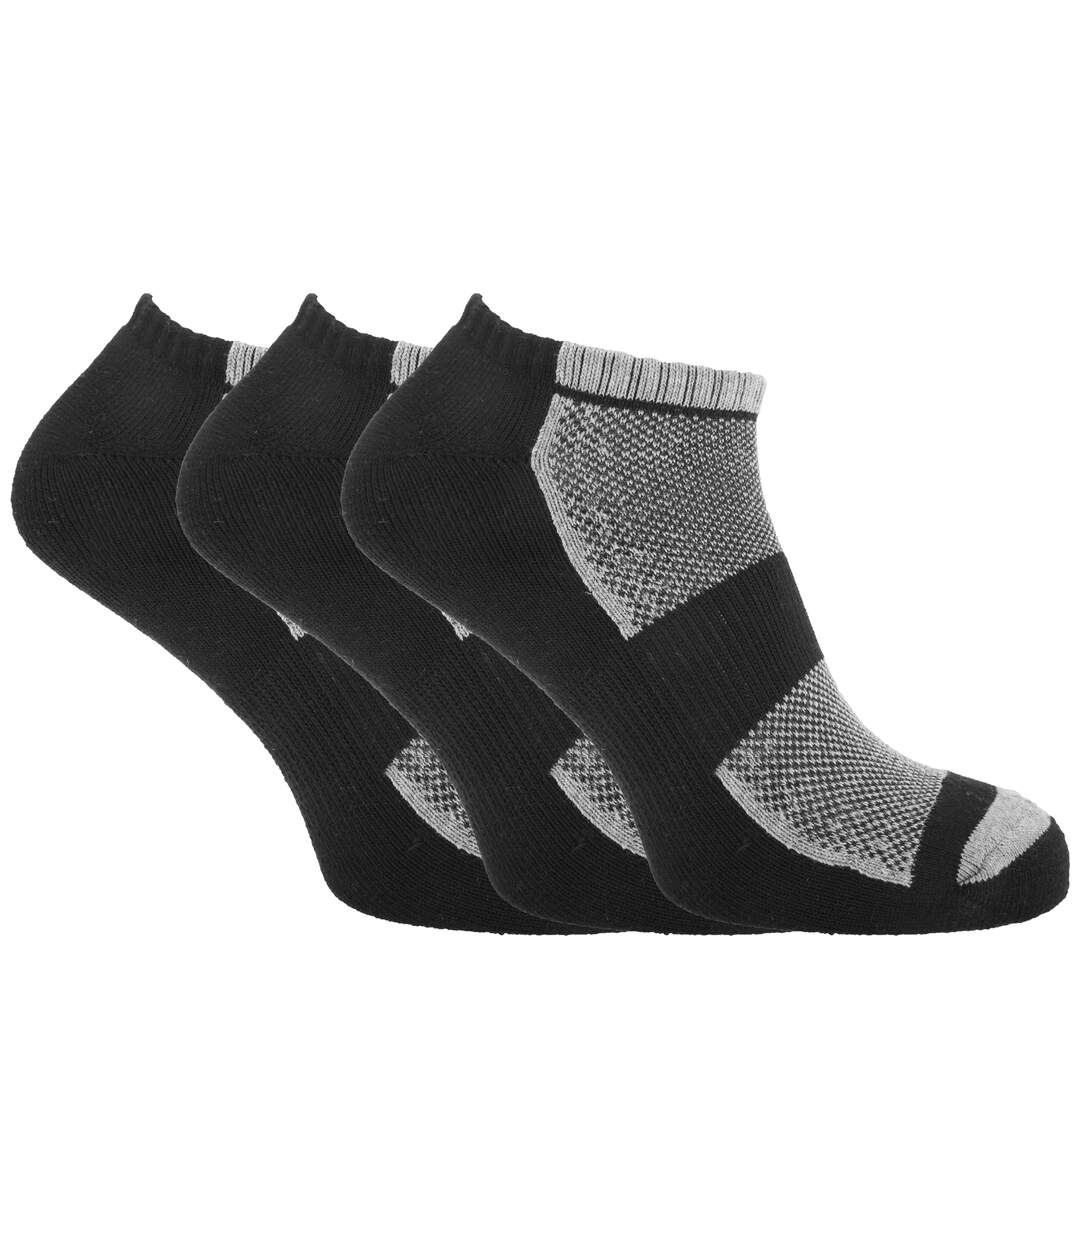 Mens Cotton Rich Sports Trainer Socks With Mesh And Ribbing (Pack Of 3) (Black/Grey Marl) - UTMB303